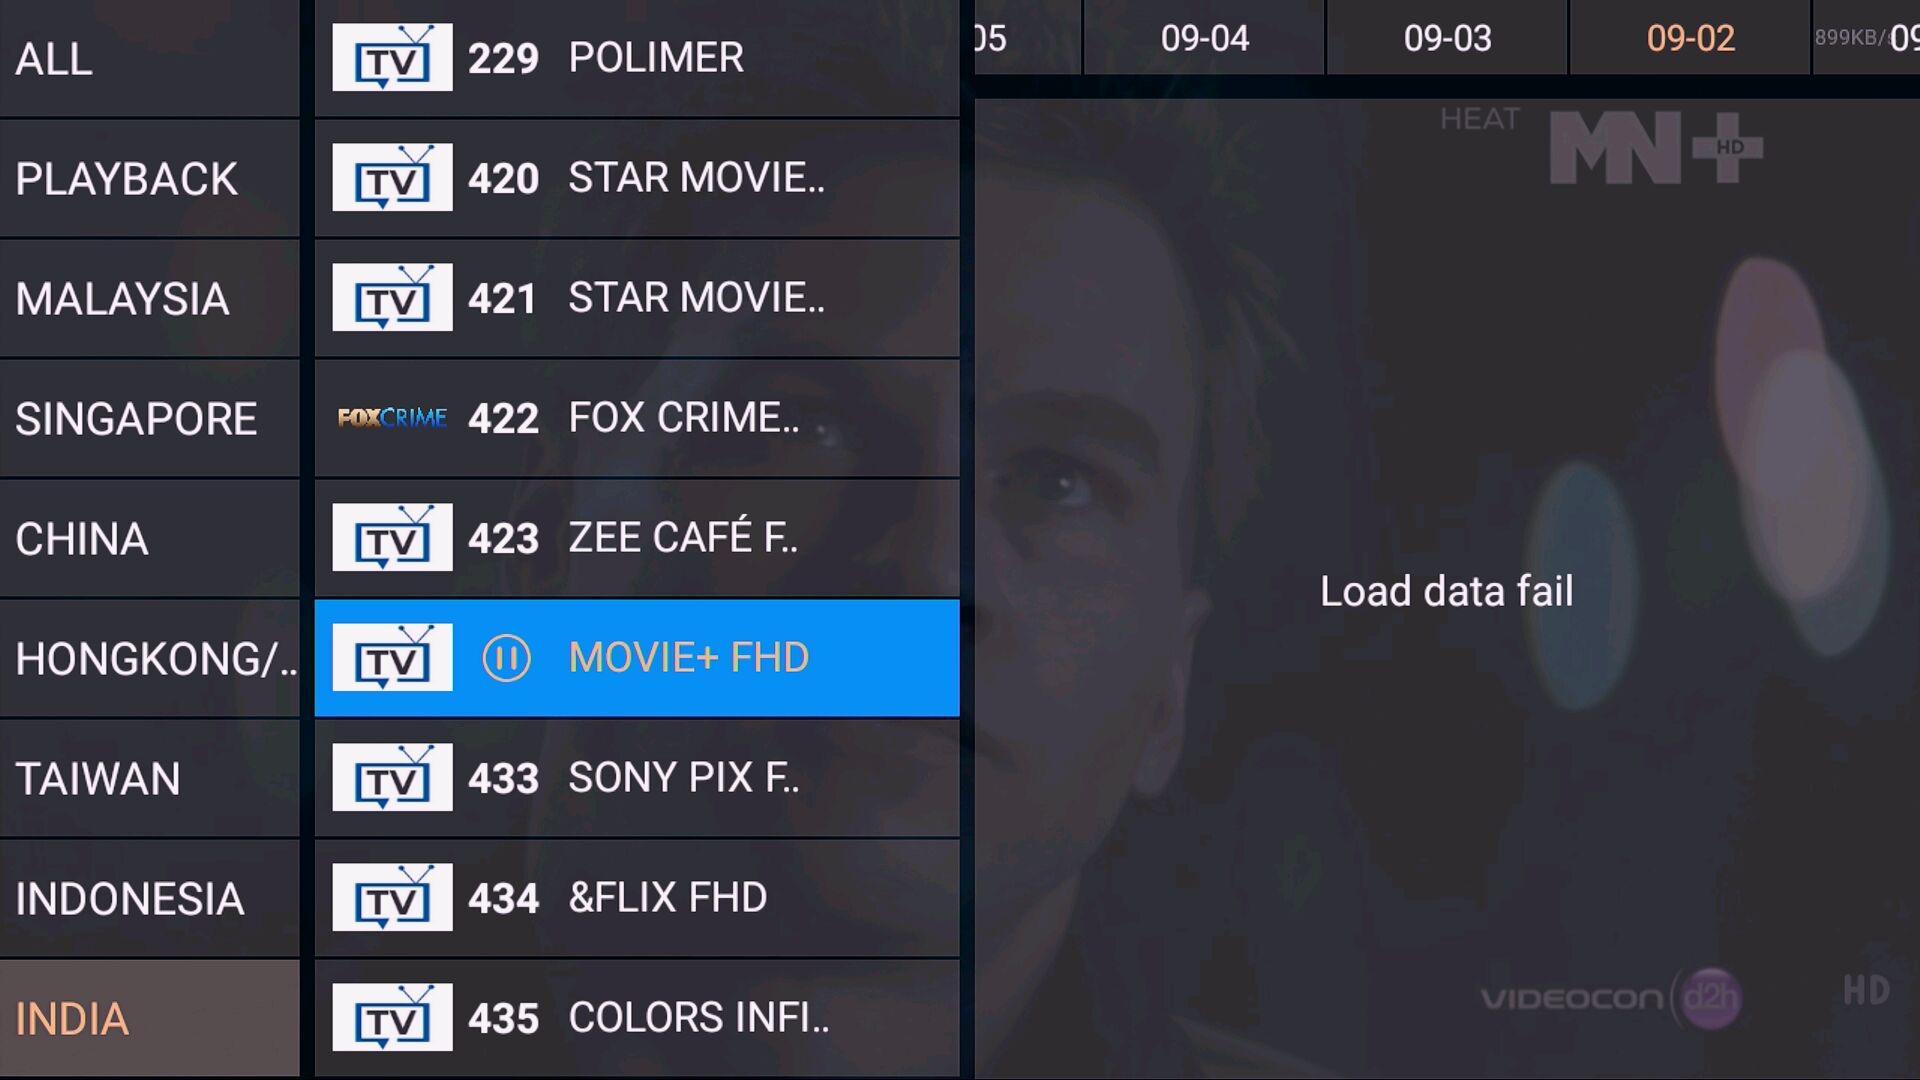 2020 latest Singapore Malaysia tv box iFibre Cloud all Starhub tv channels astro 9